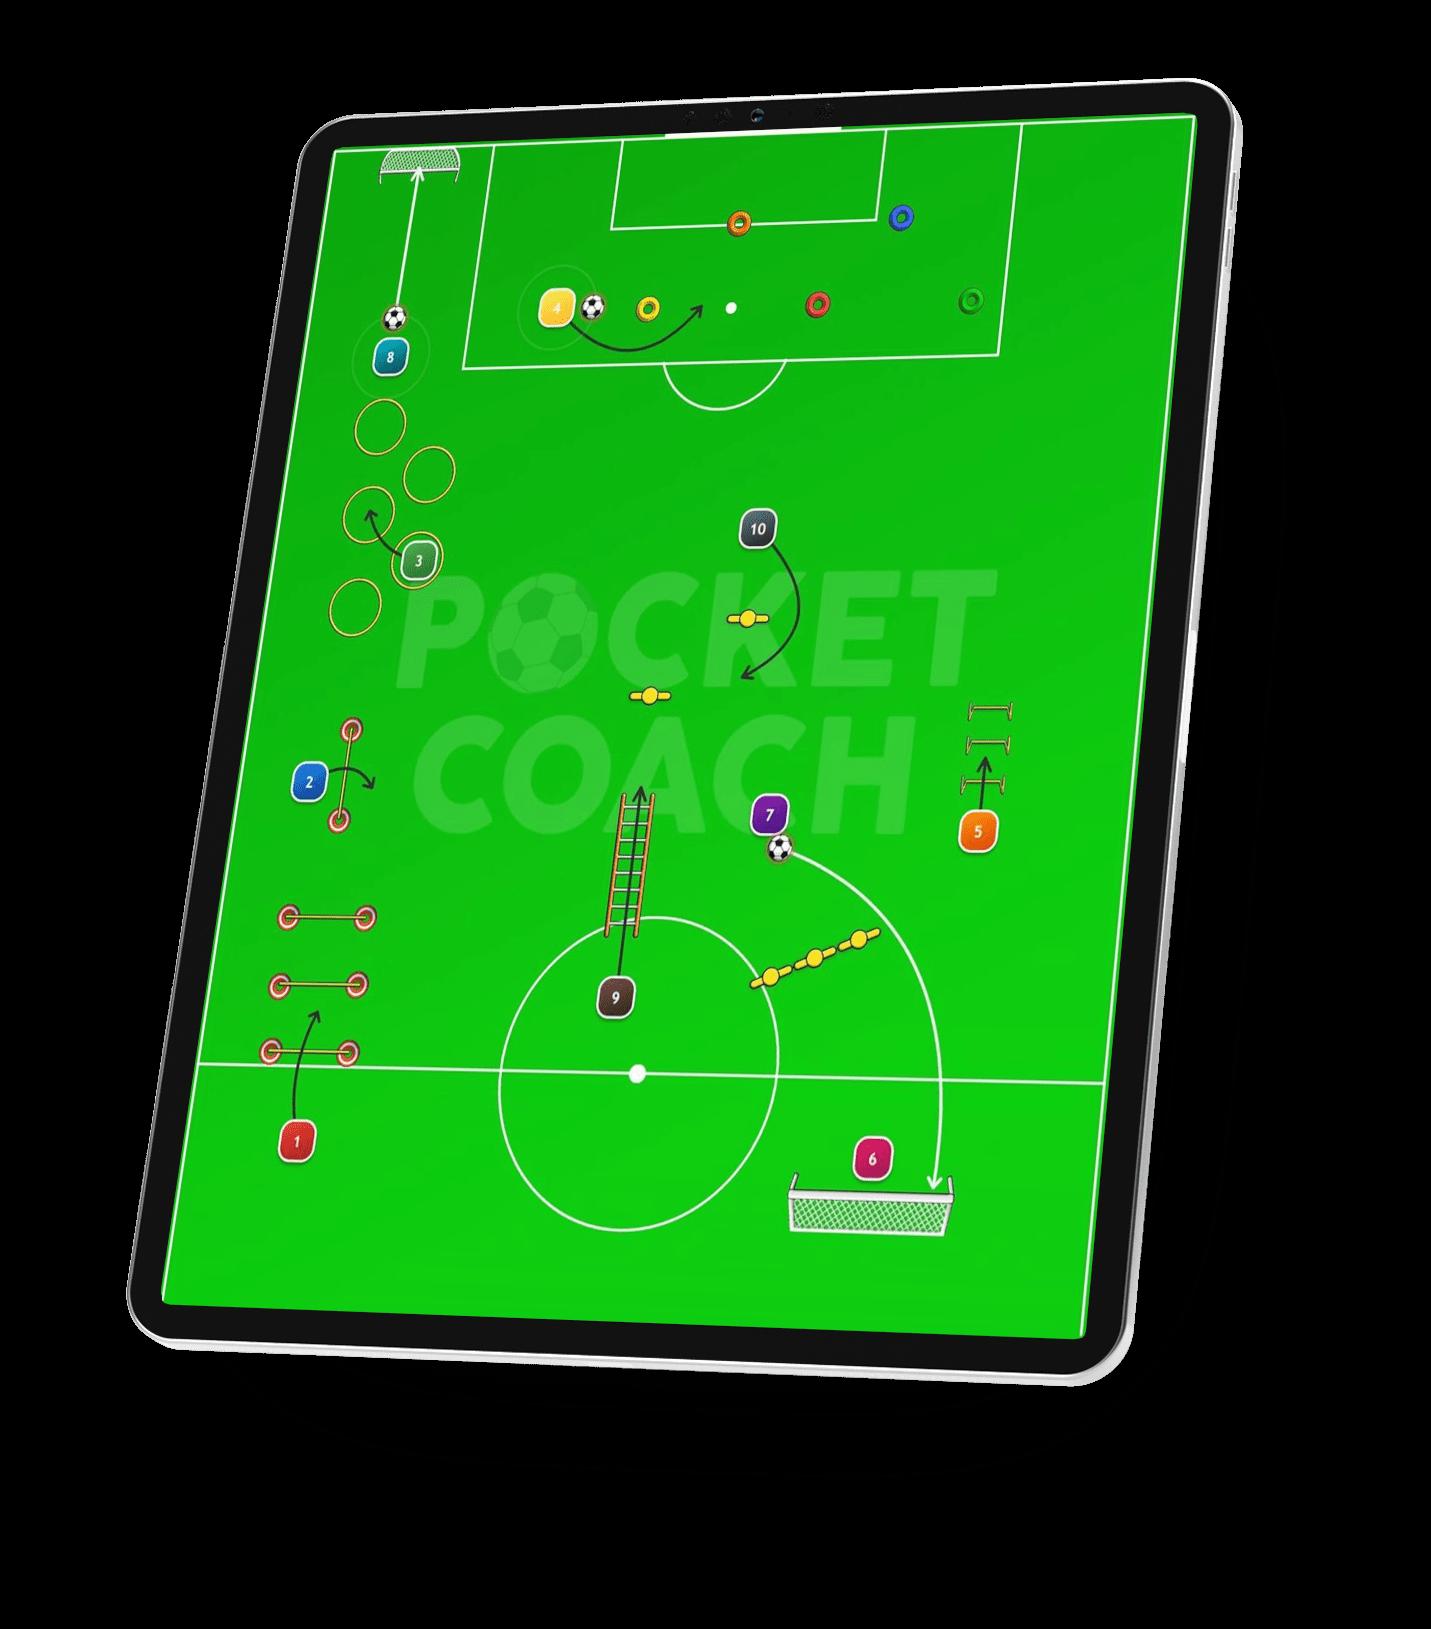 Pocket Coach tactical board